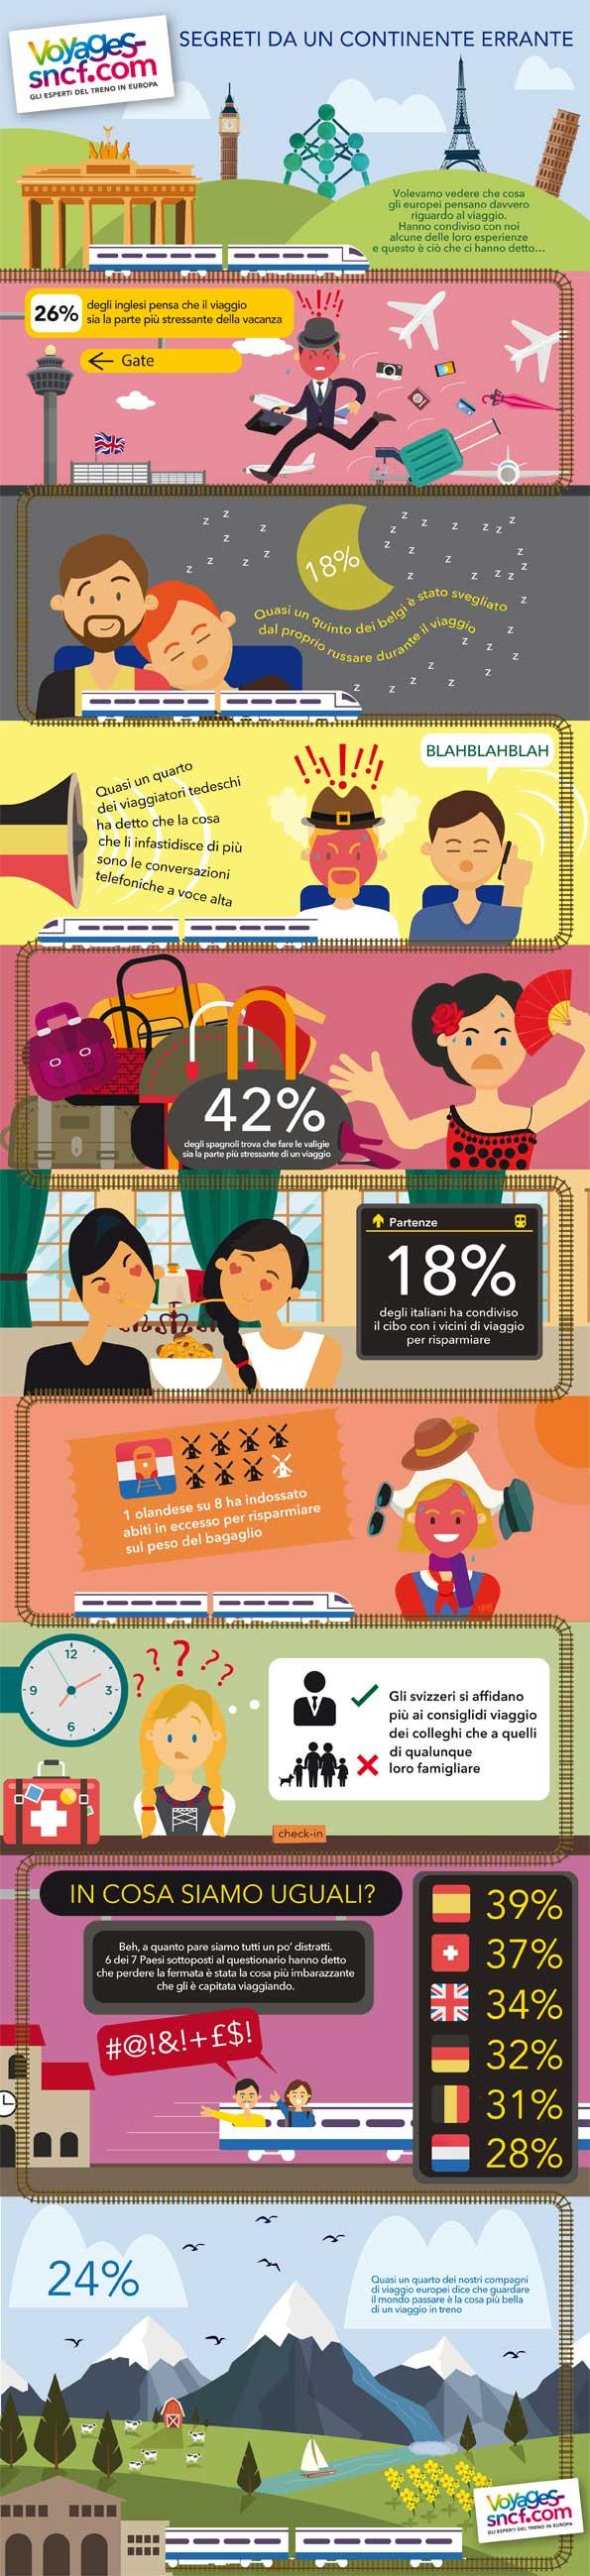 sncf-infografica_ita